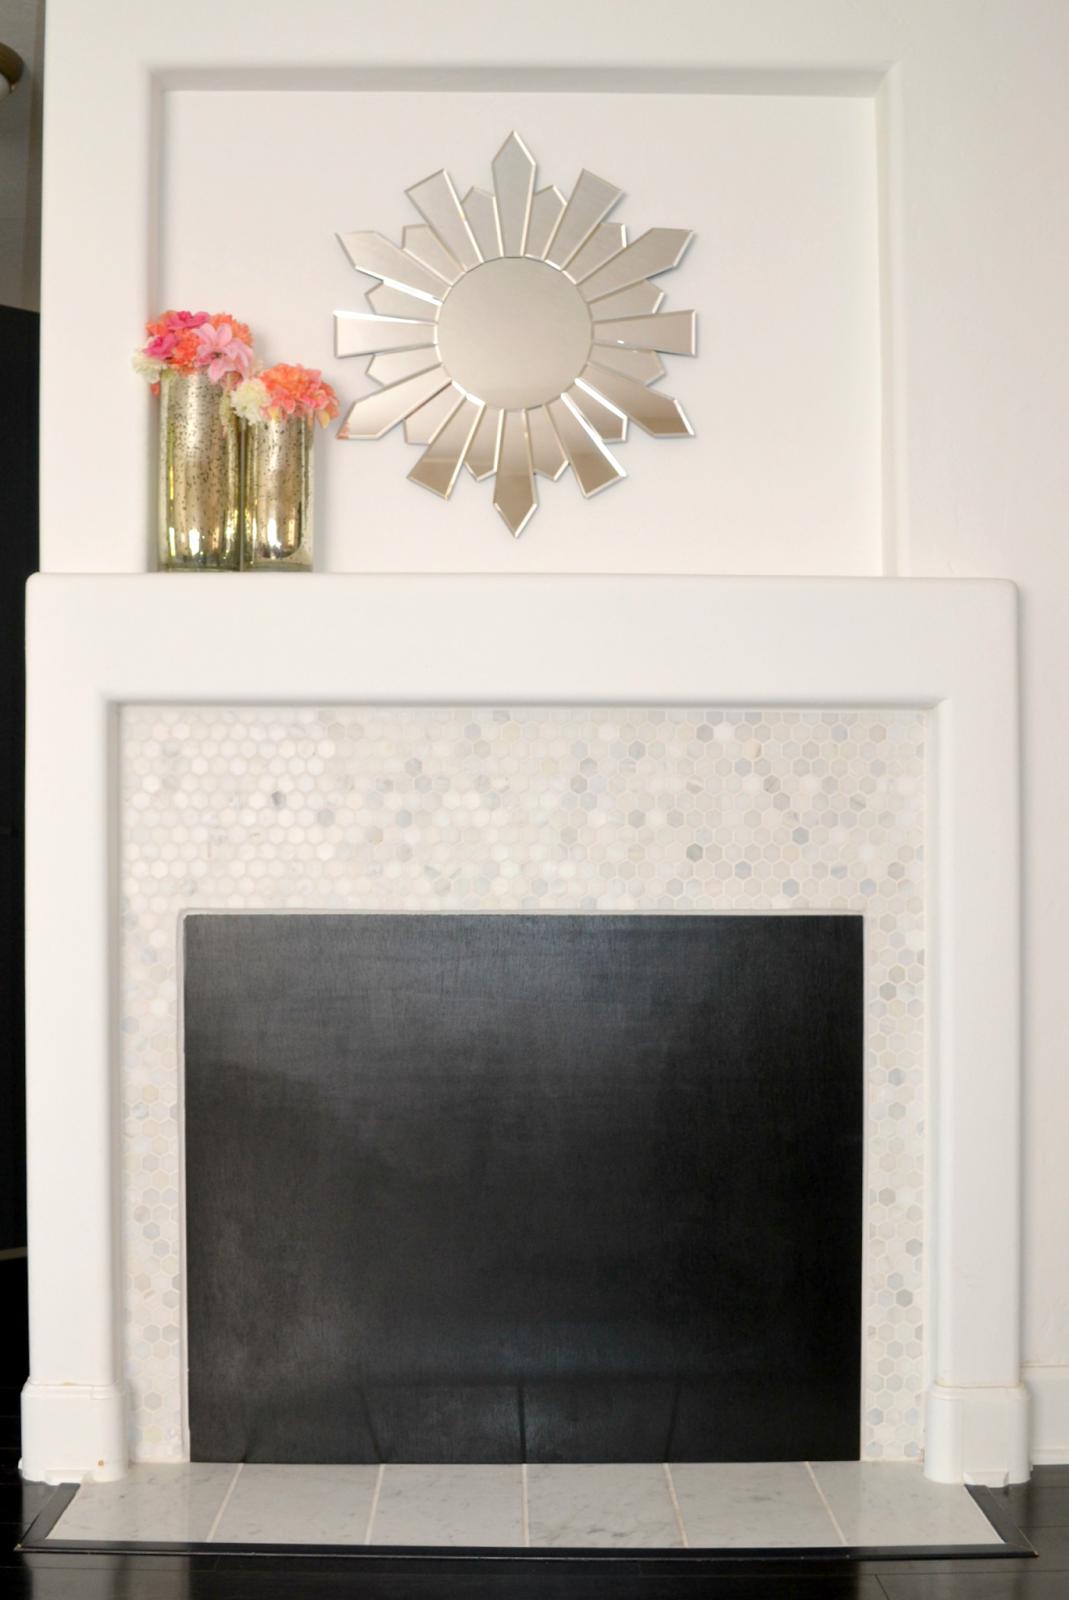 DETTE CAKES: DIY: Chalkboard Fireplace Cover!